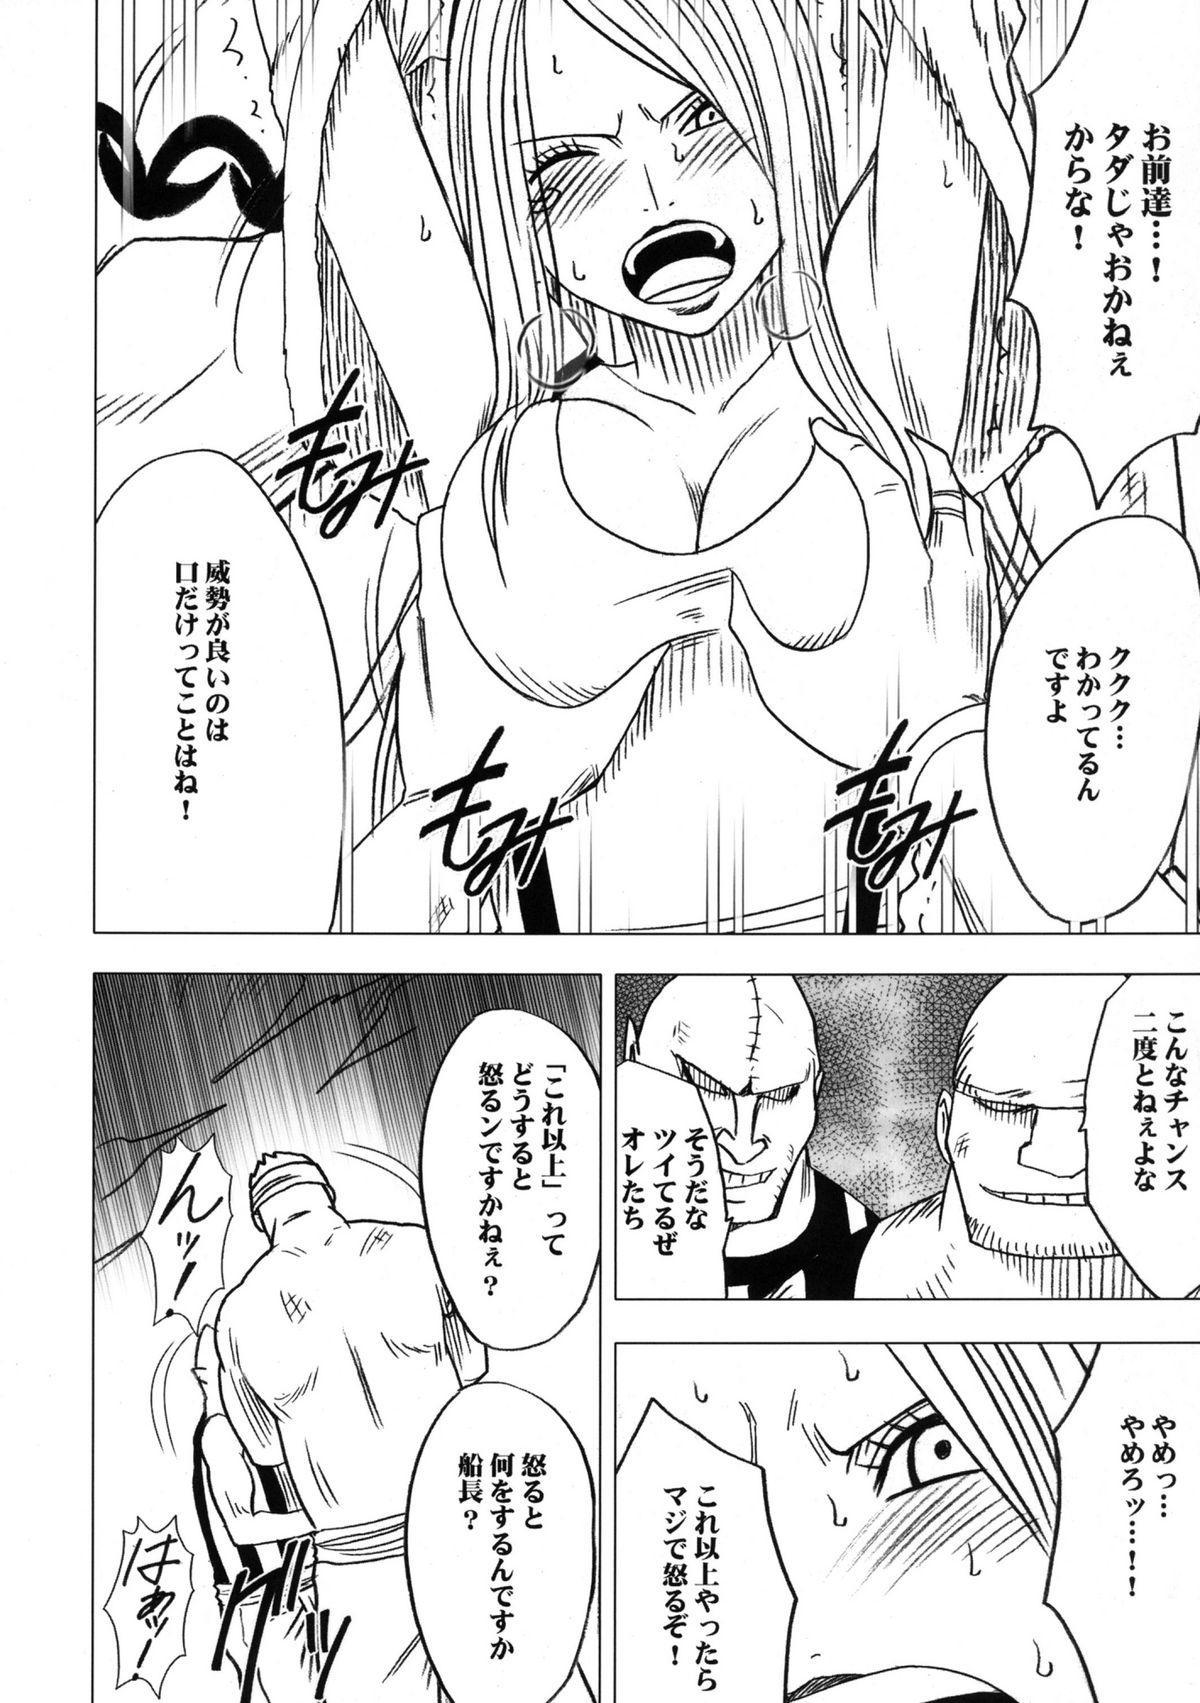 Onna Kaizoku Haiboku Soushuuhen 89